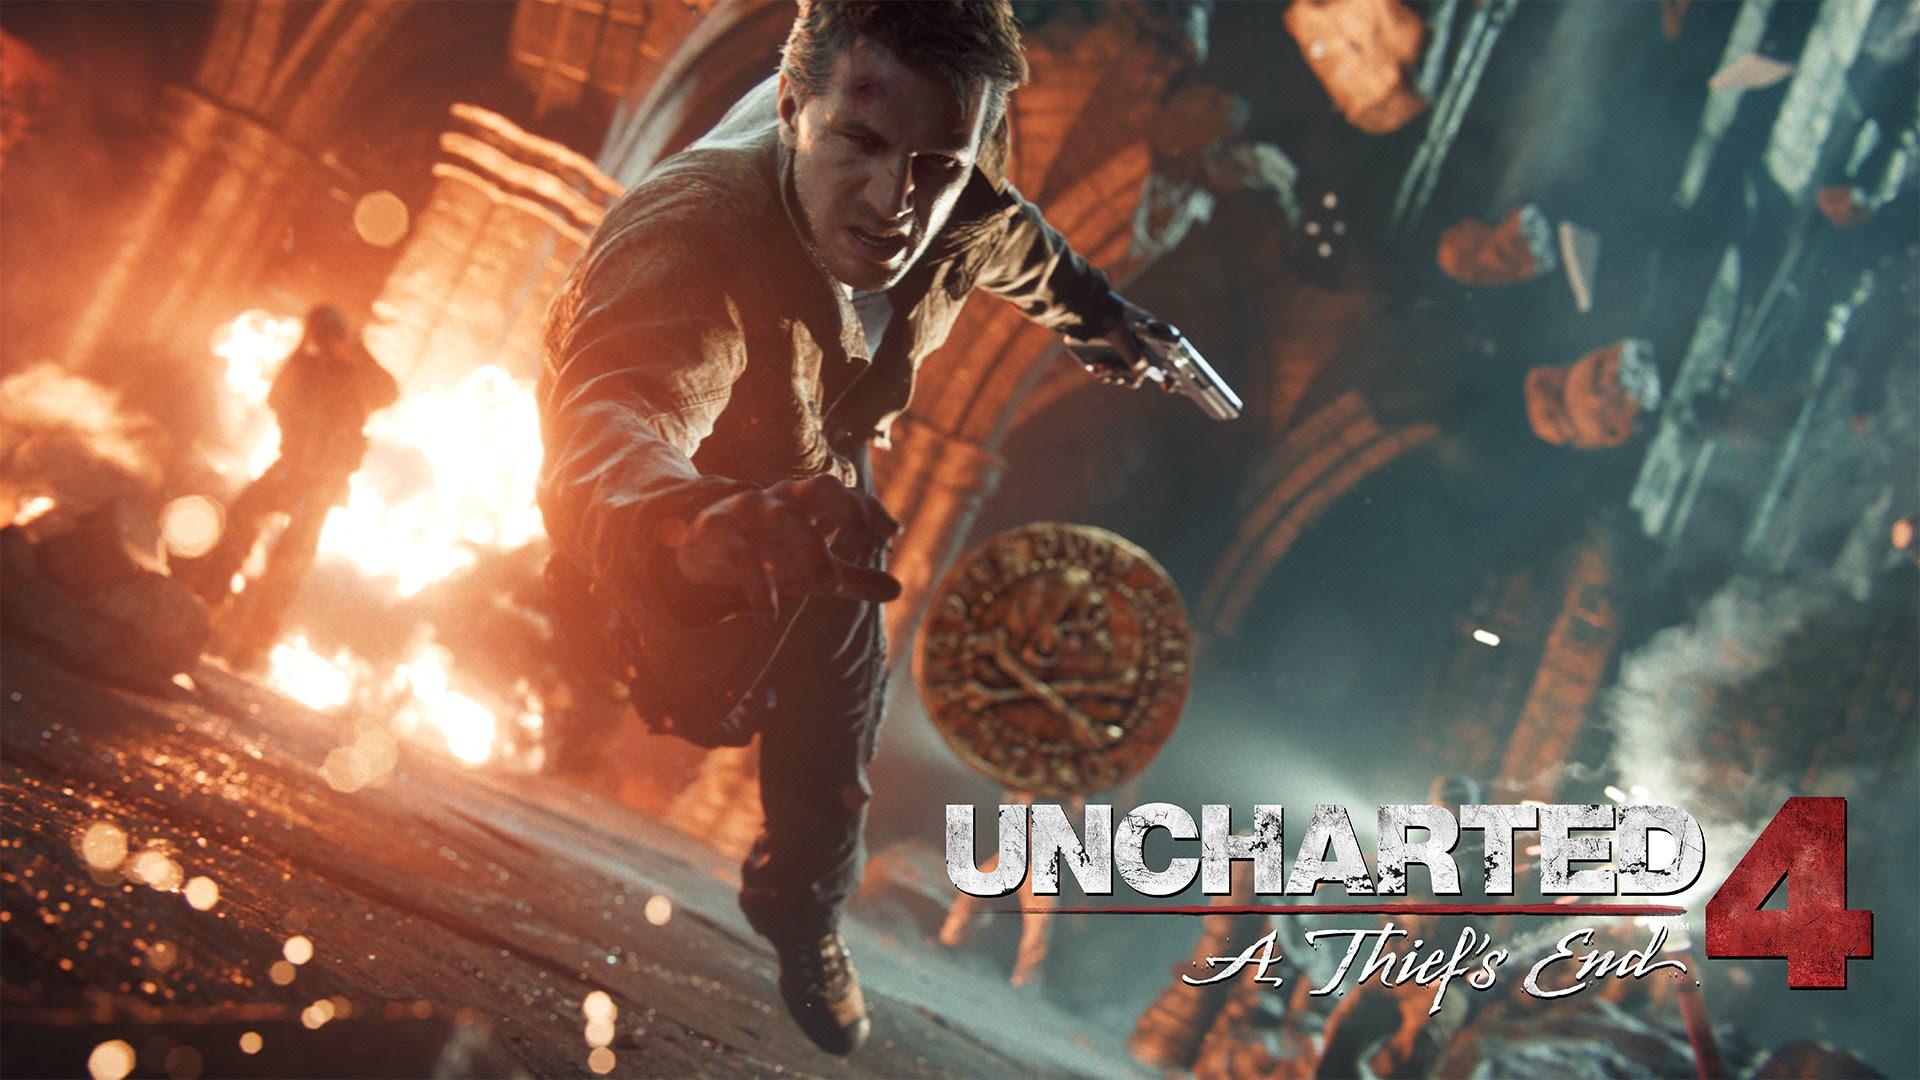 Uncharted 4 מוביל את טבלת המכירות בבריטניה